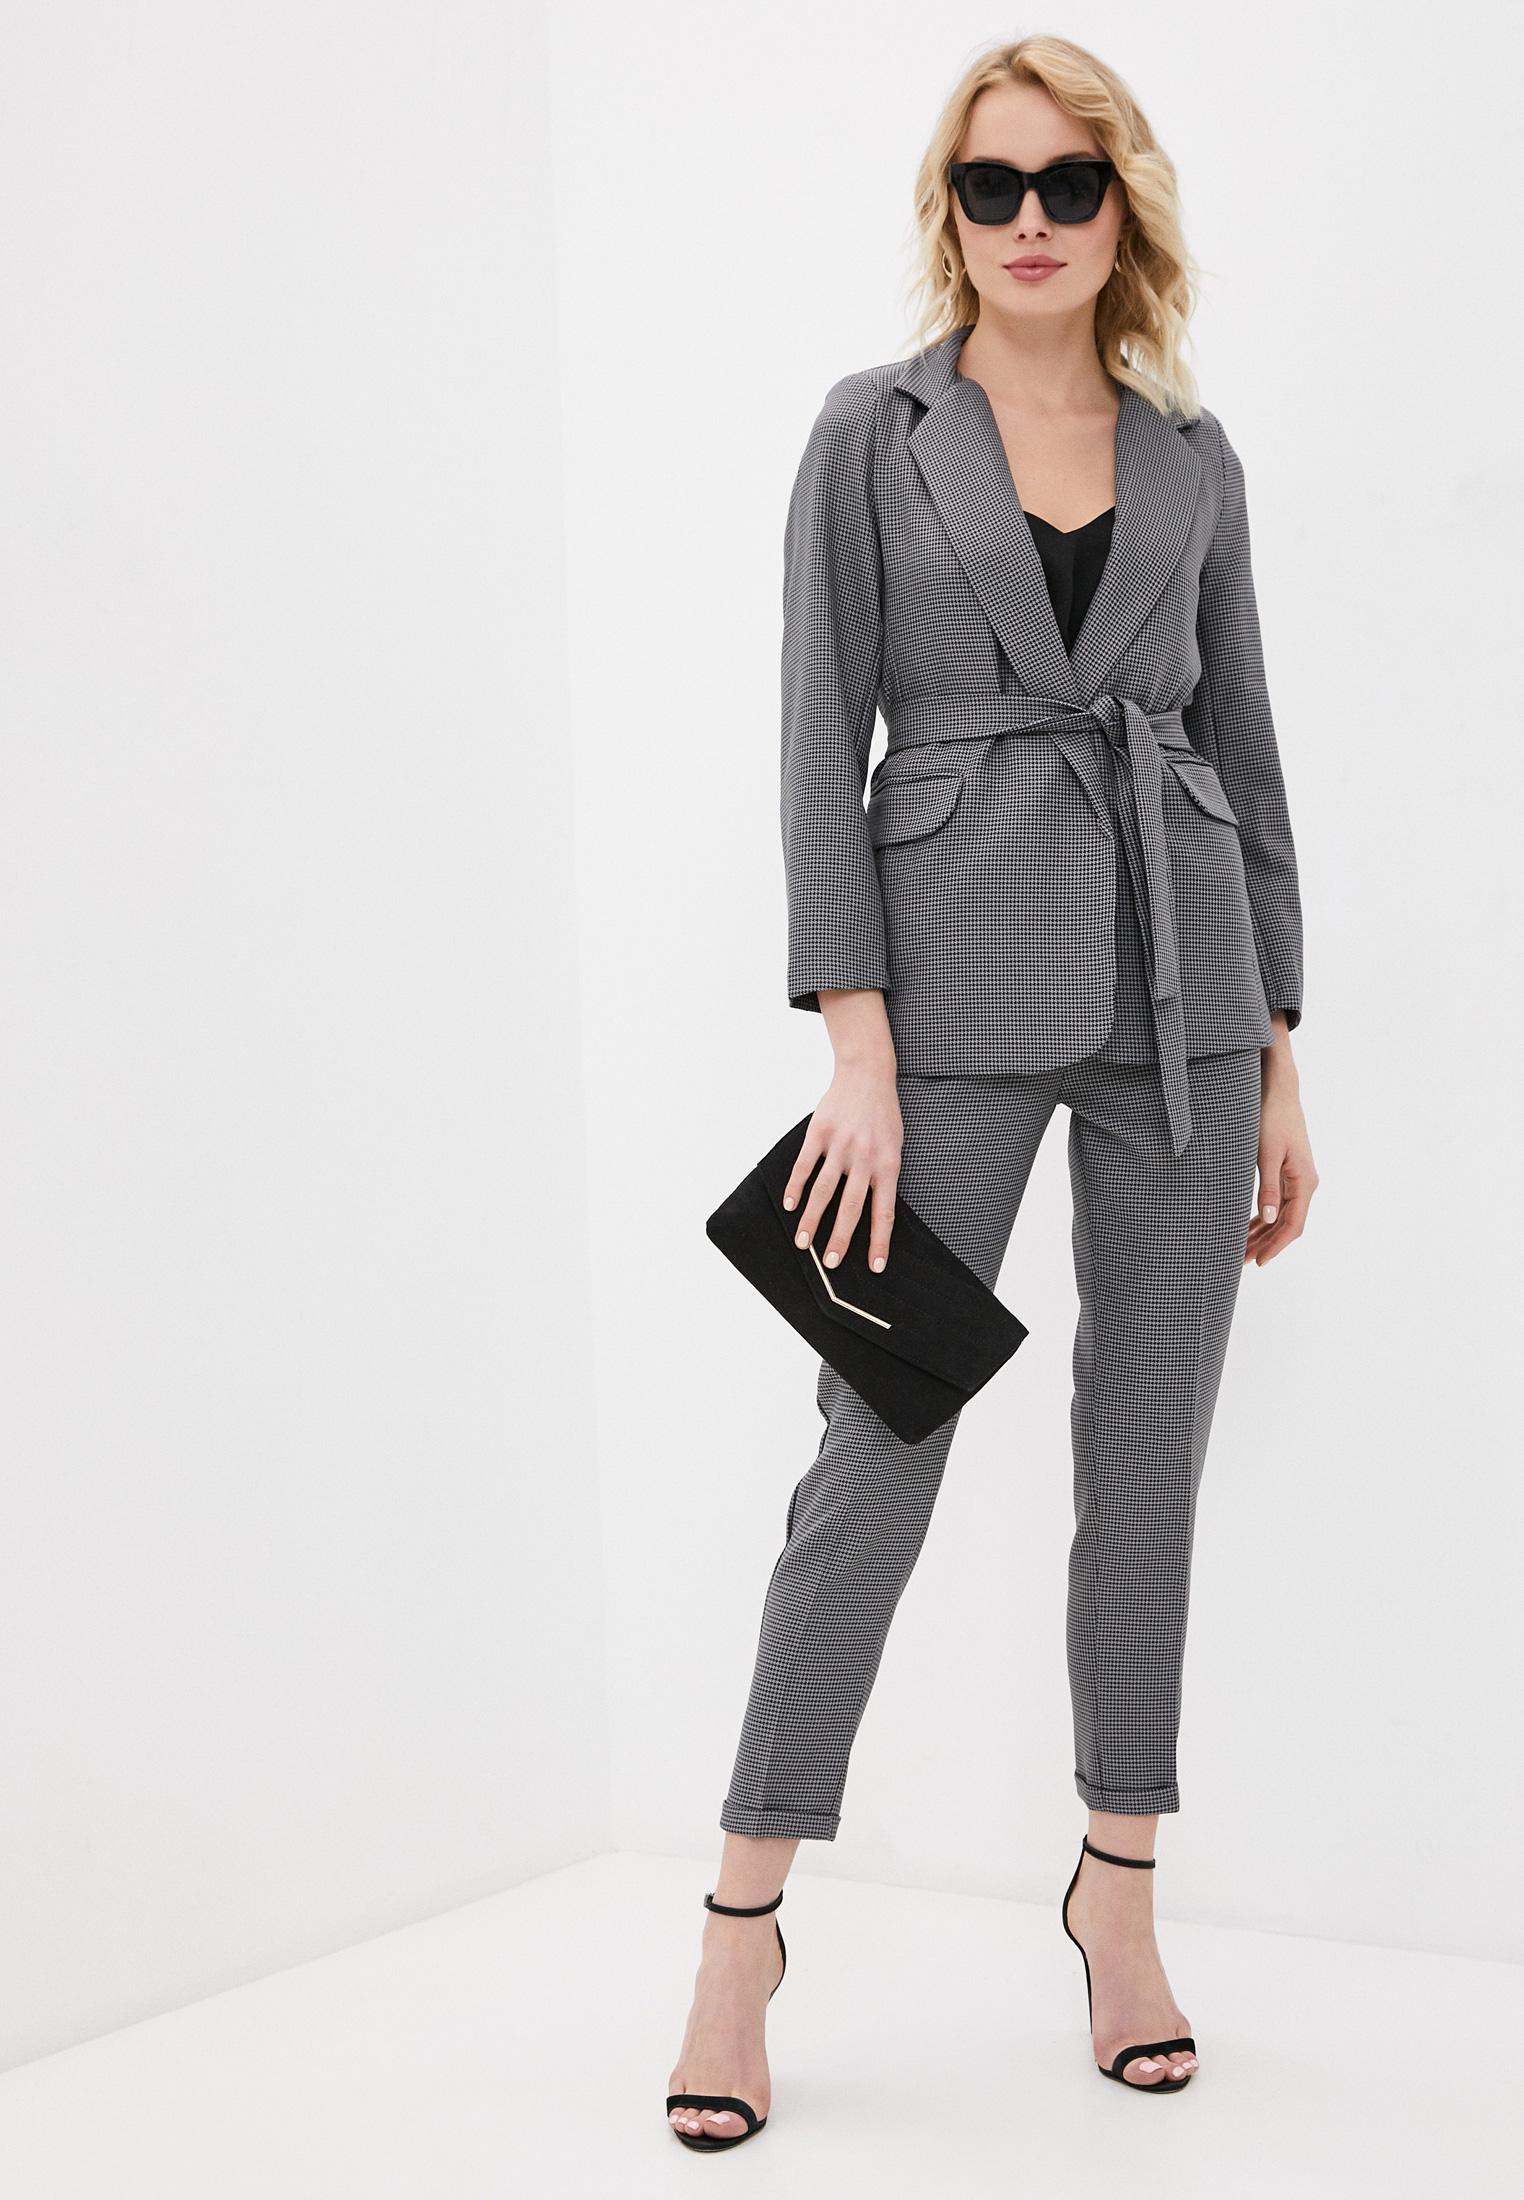 Костюм с брюками Dunia DU21-77